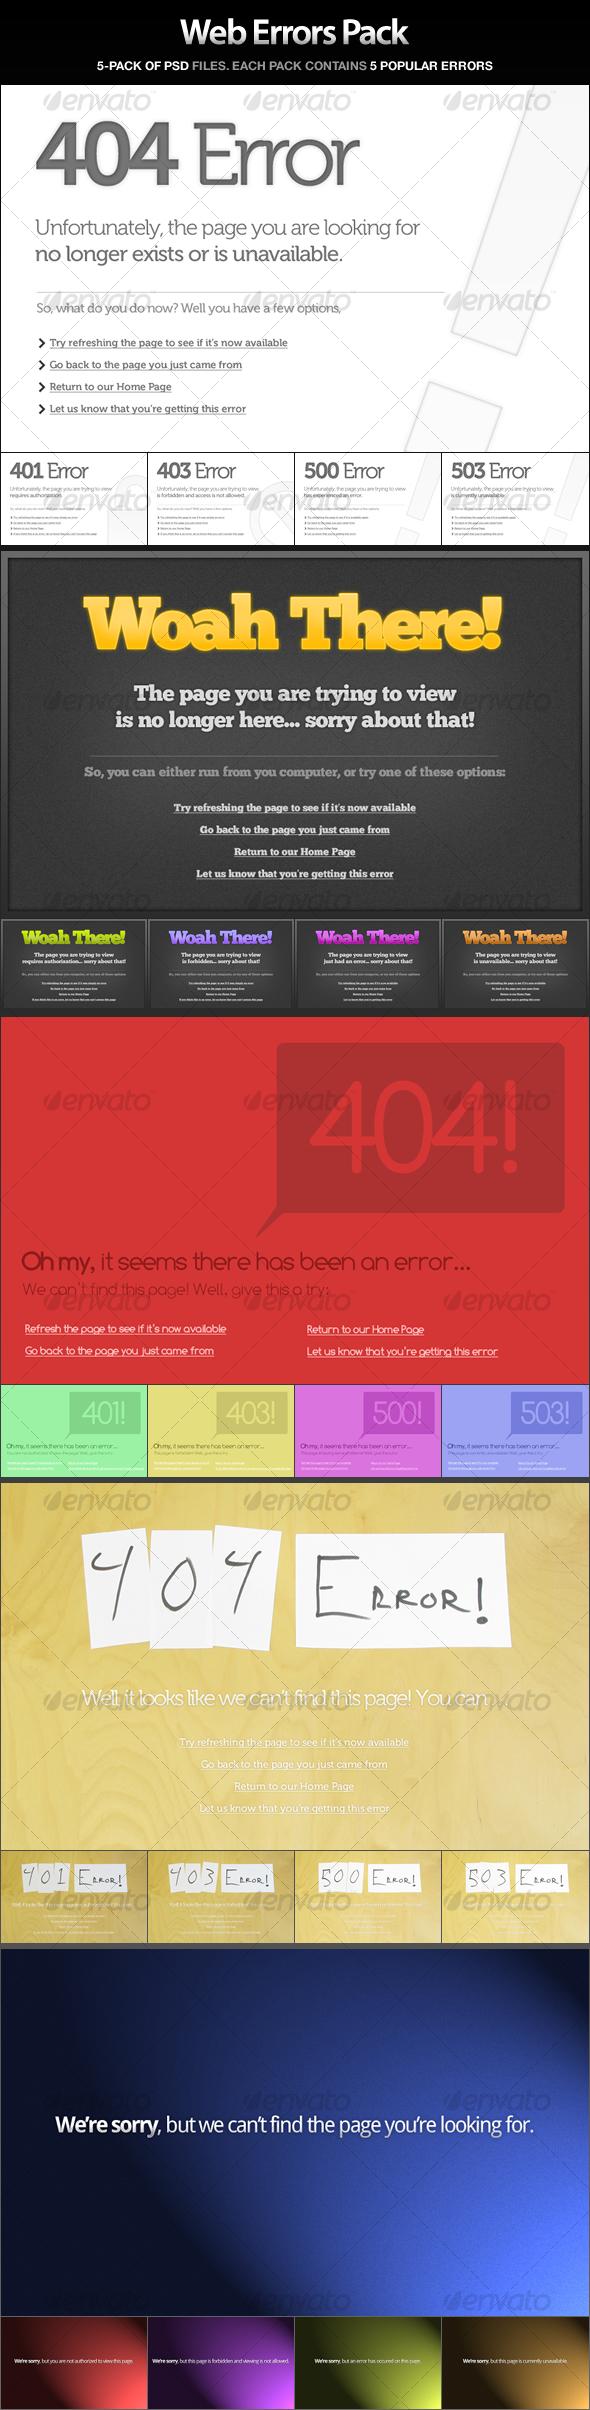 GraphicRiver Web Errors Pack 404 401 403 500 503 46697